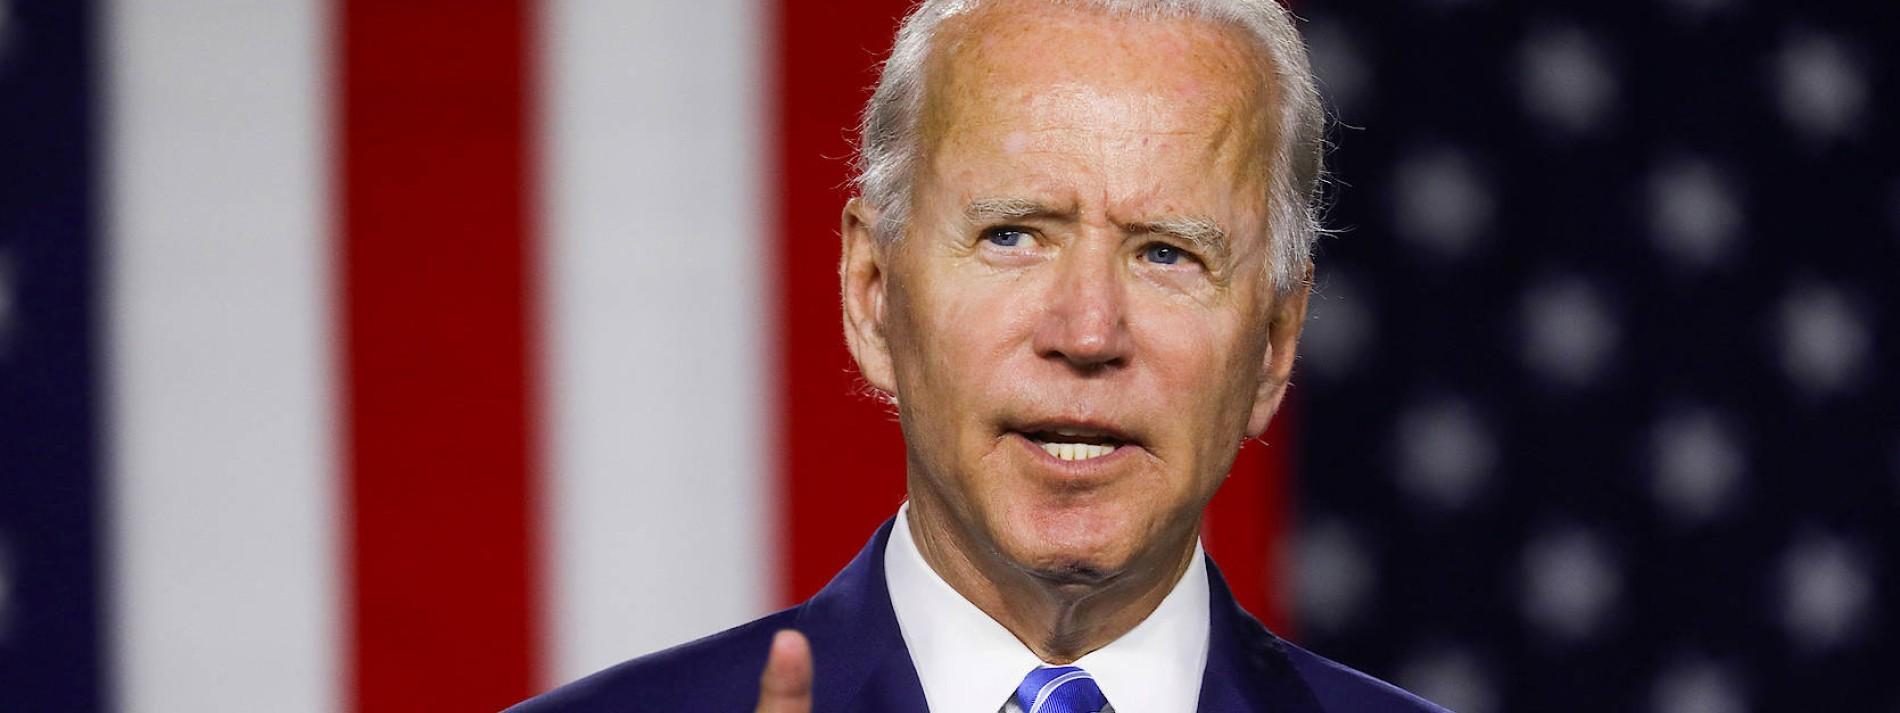 Wie links ist Joe Biden?